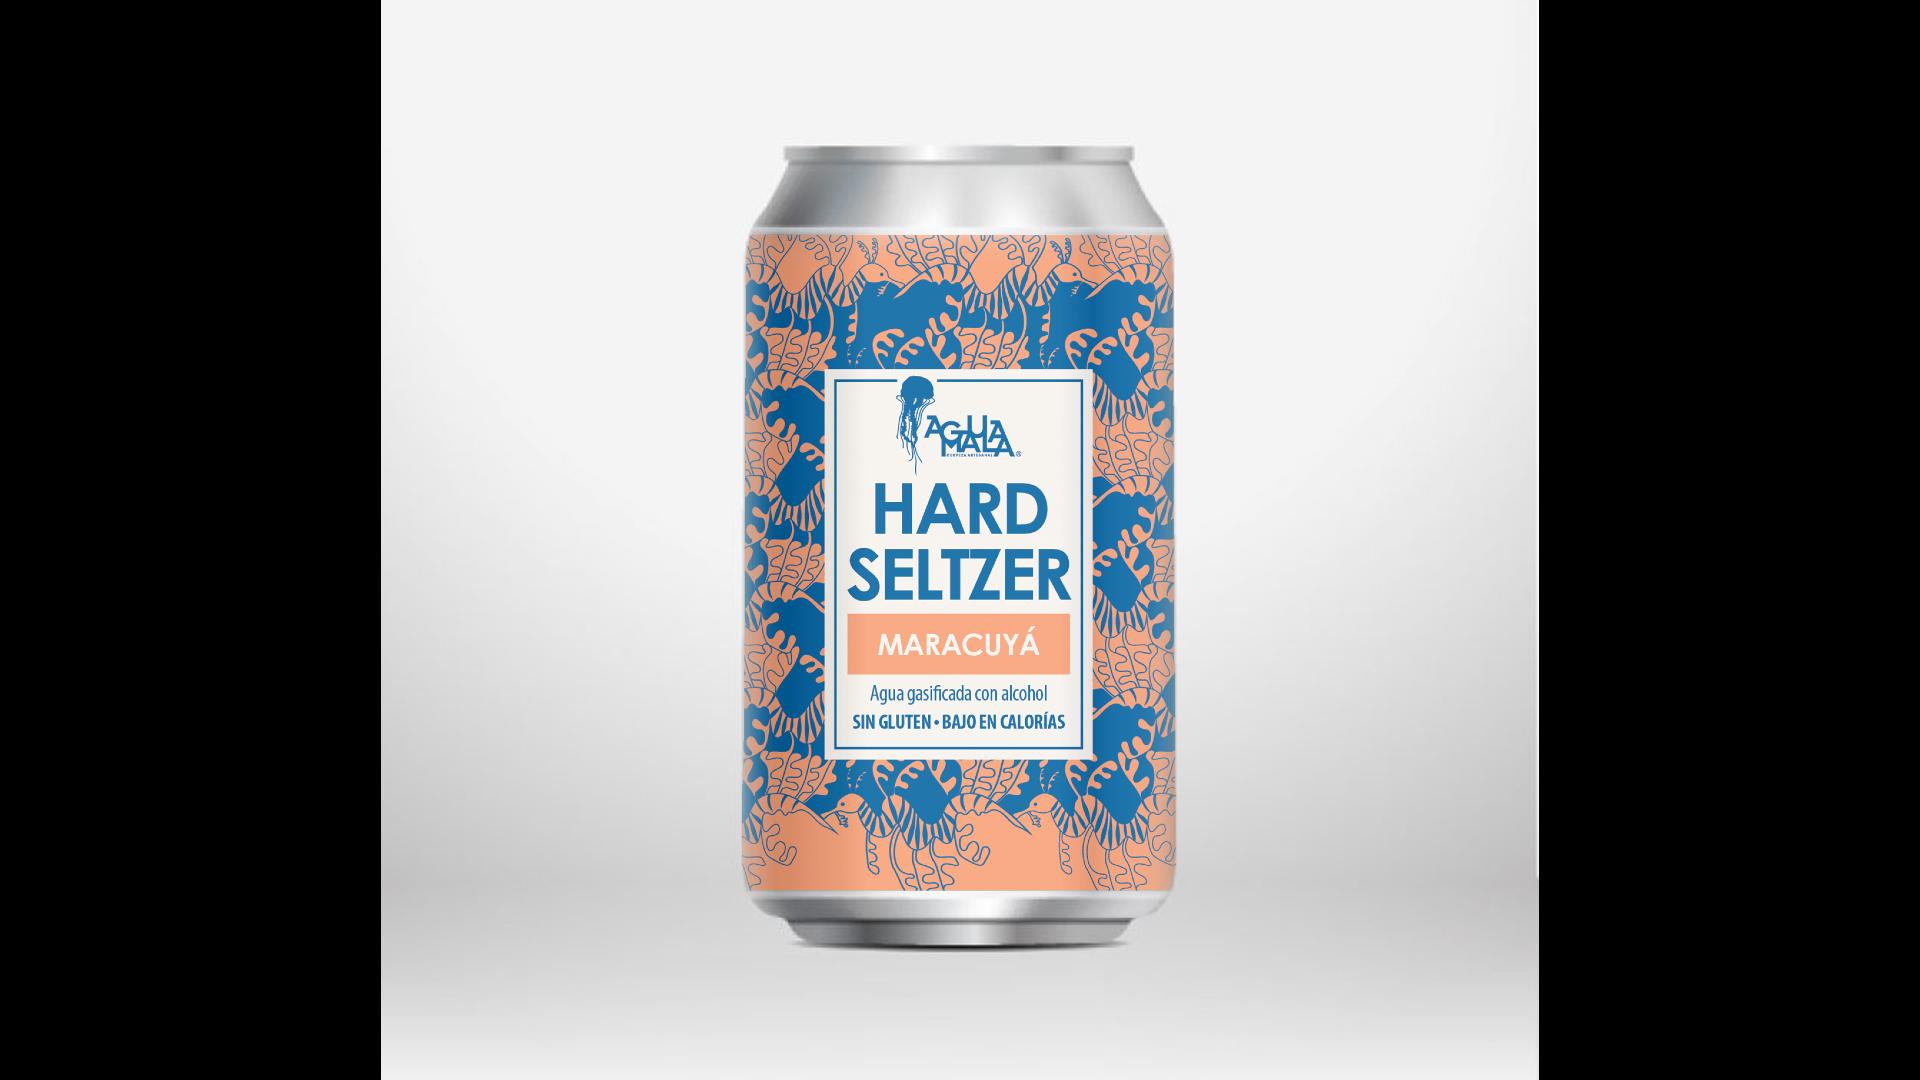 Hard seltzer de maracuyá, Cervecería Aguamala